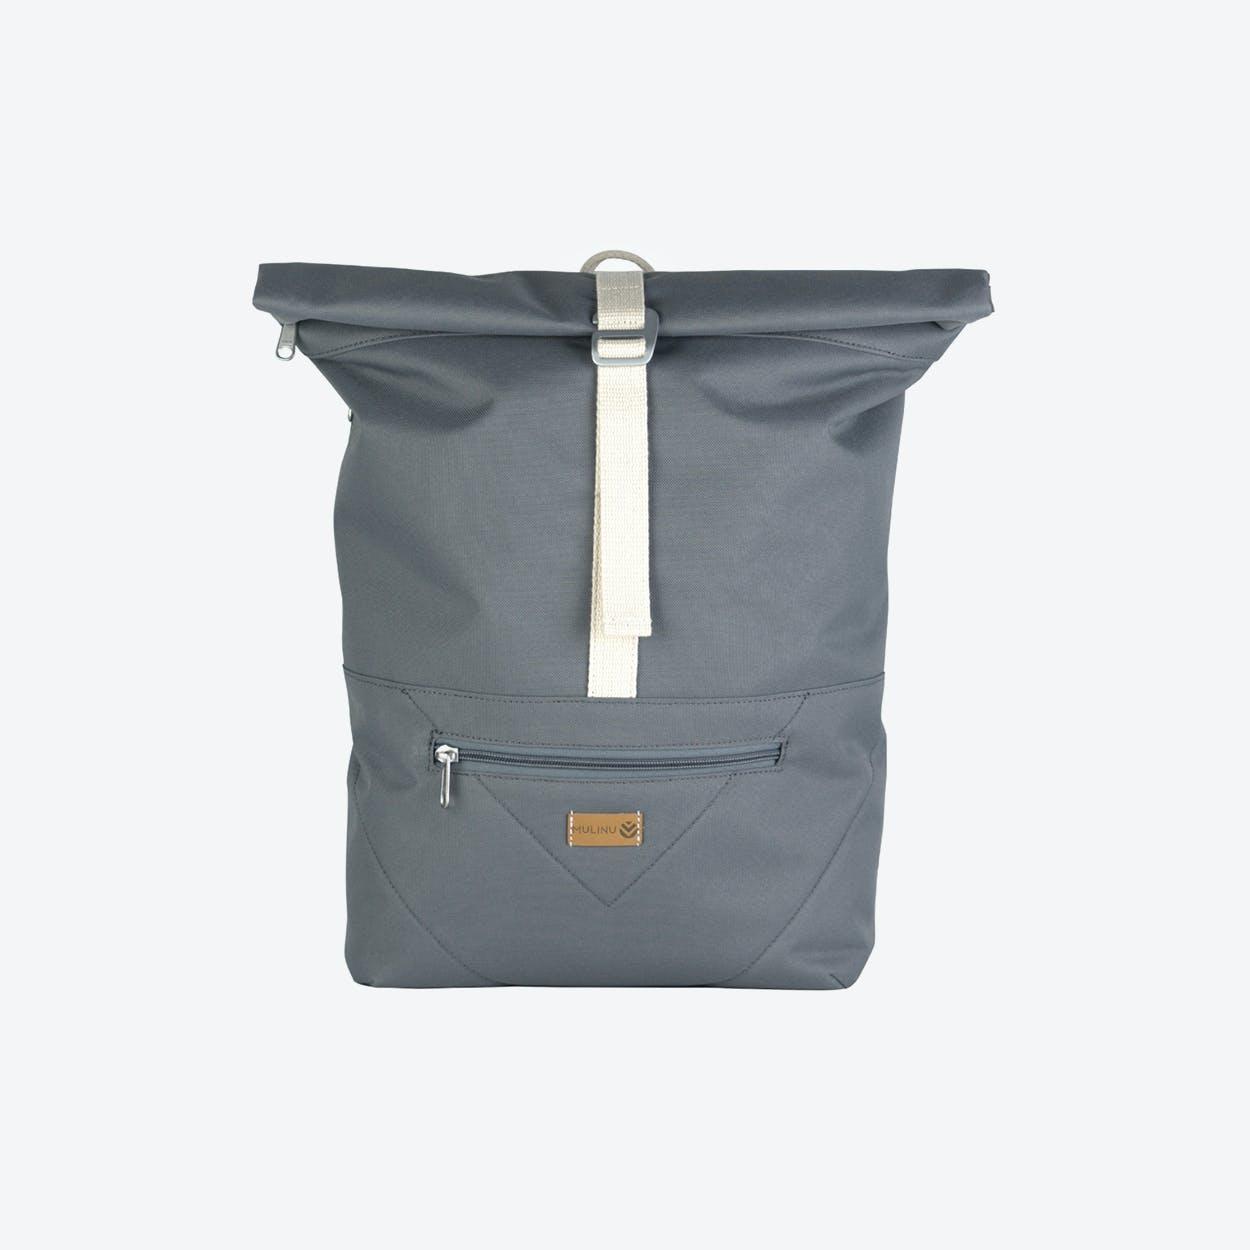 CLASSIC ALBERT 2 Grey